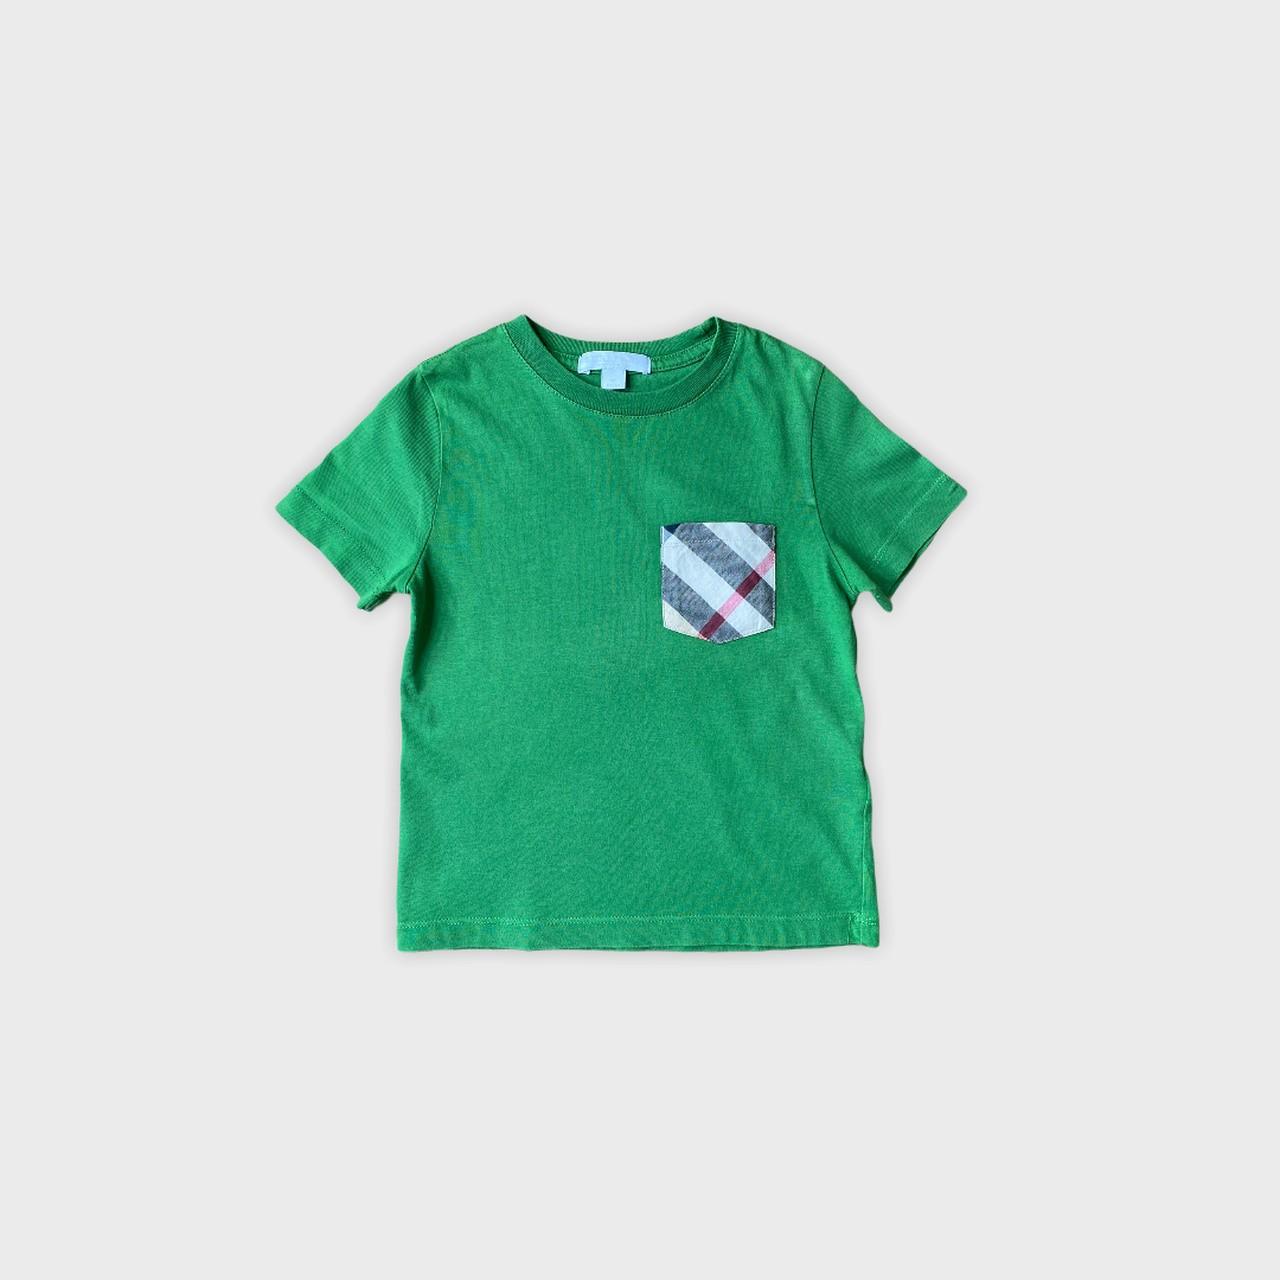 Camiseta Burberry 4 anos